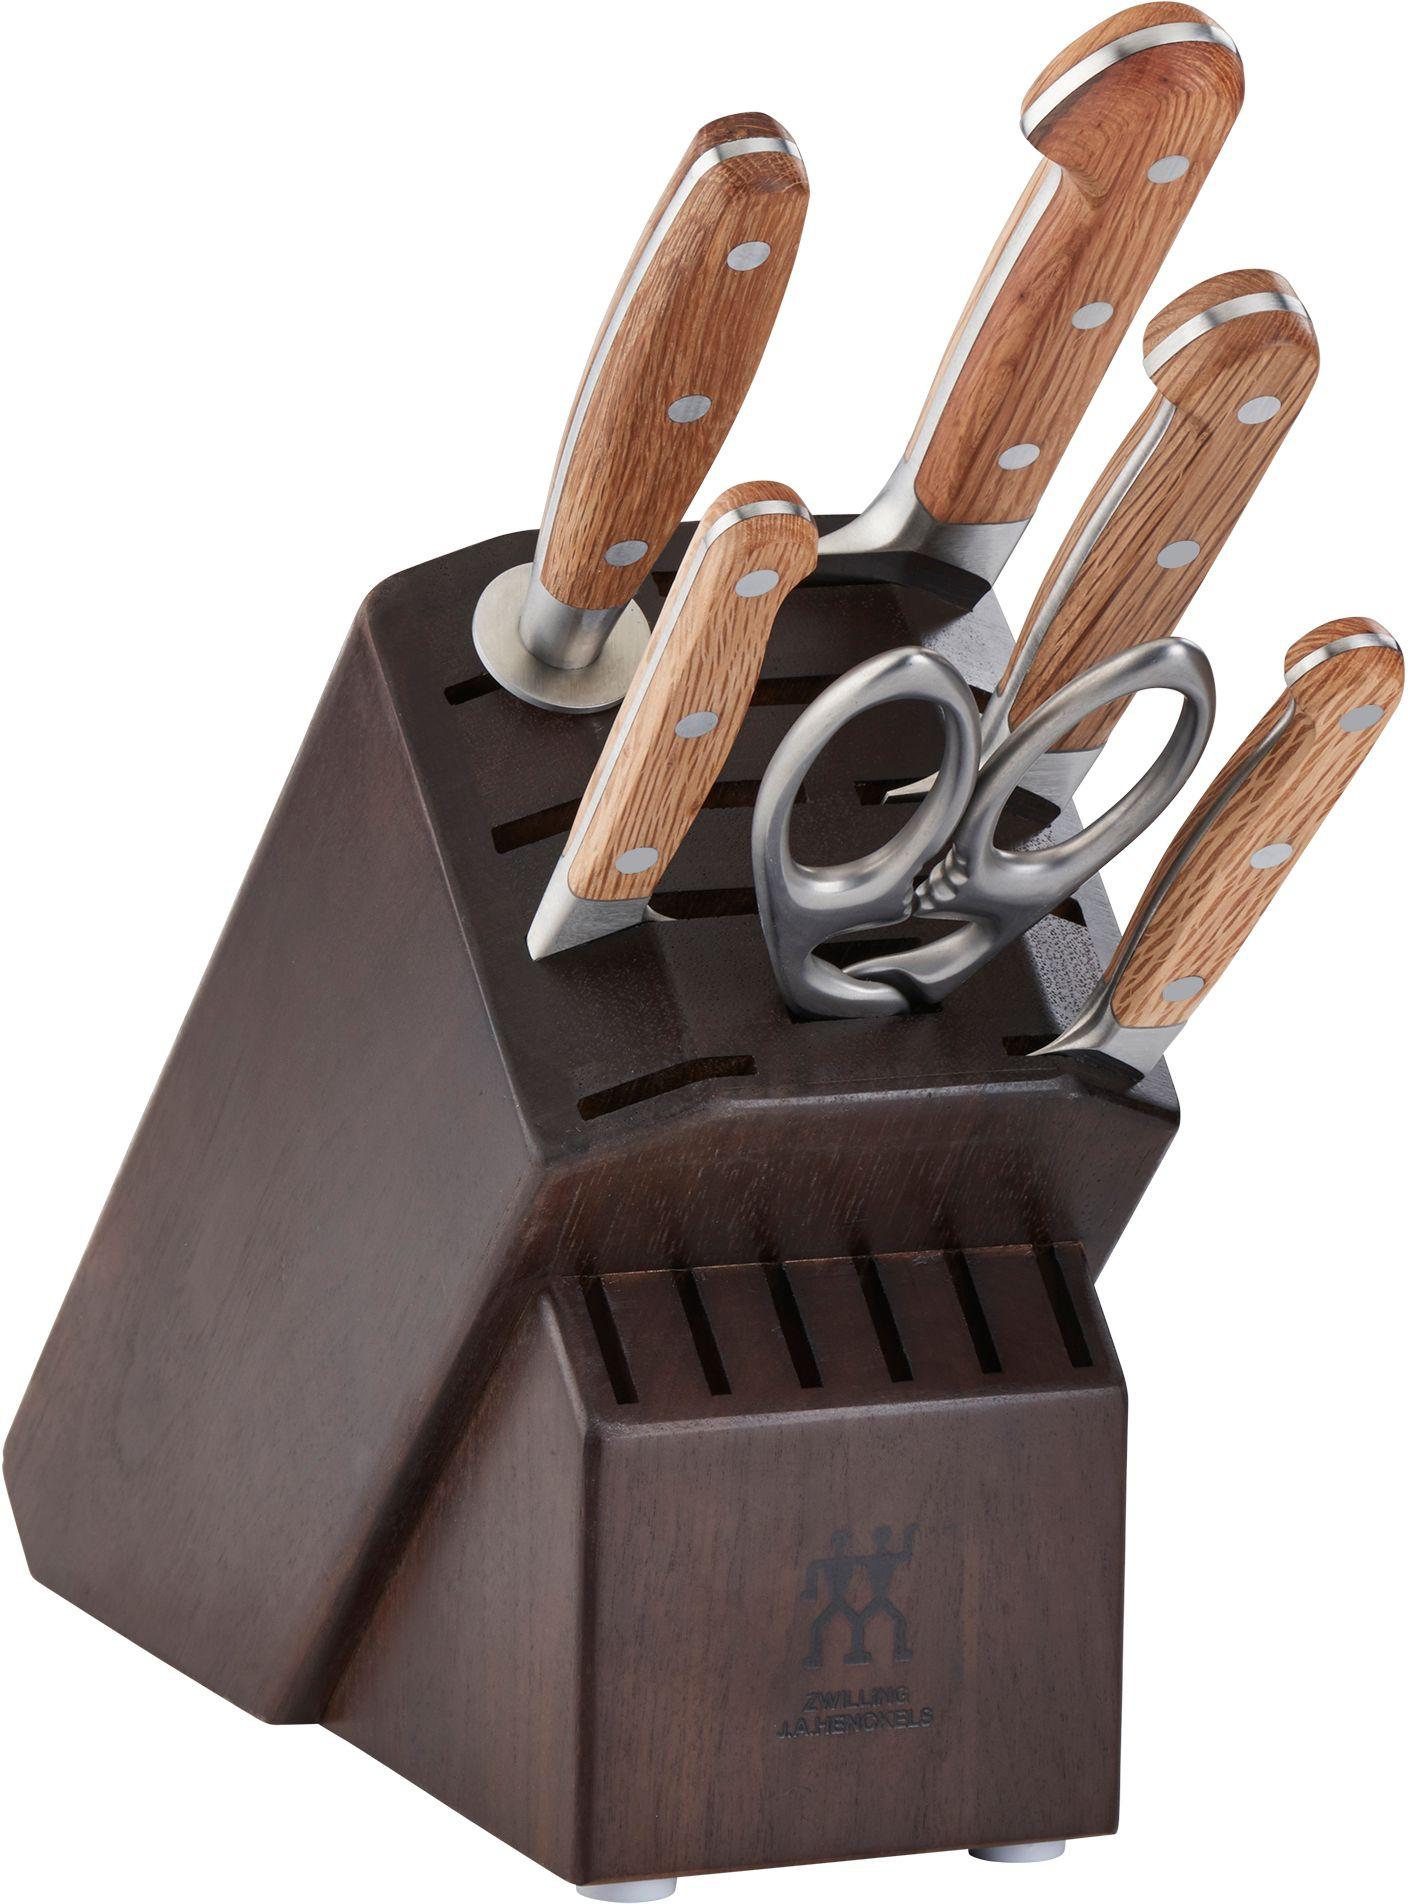 Zwilling J.A. Henckels Pro Holm 7 Piece Knife Block Set, Walnut Block